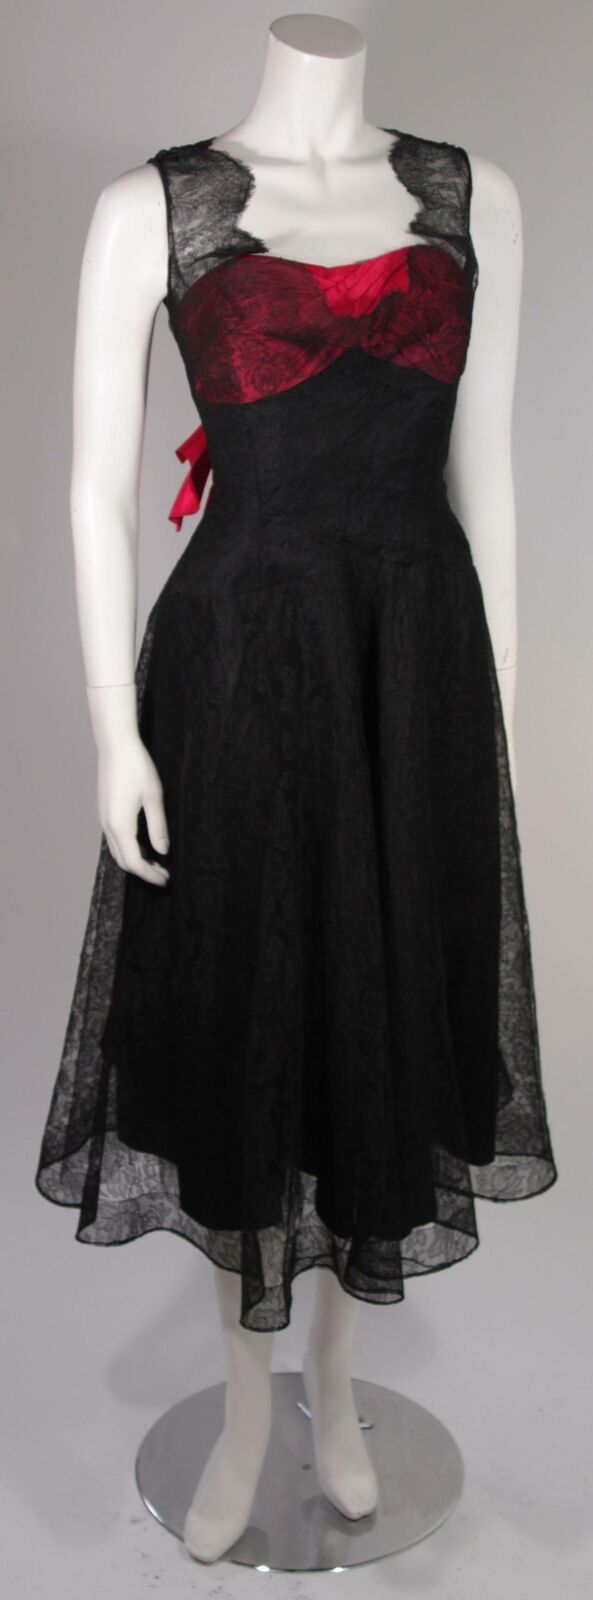 CEIL CHAPMAN Black Lace Cocktail Dress with Large… - image 3